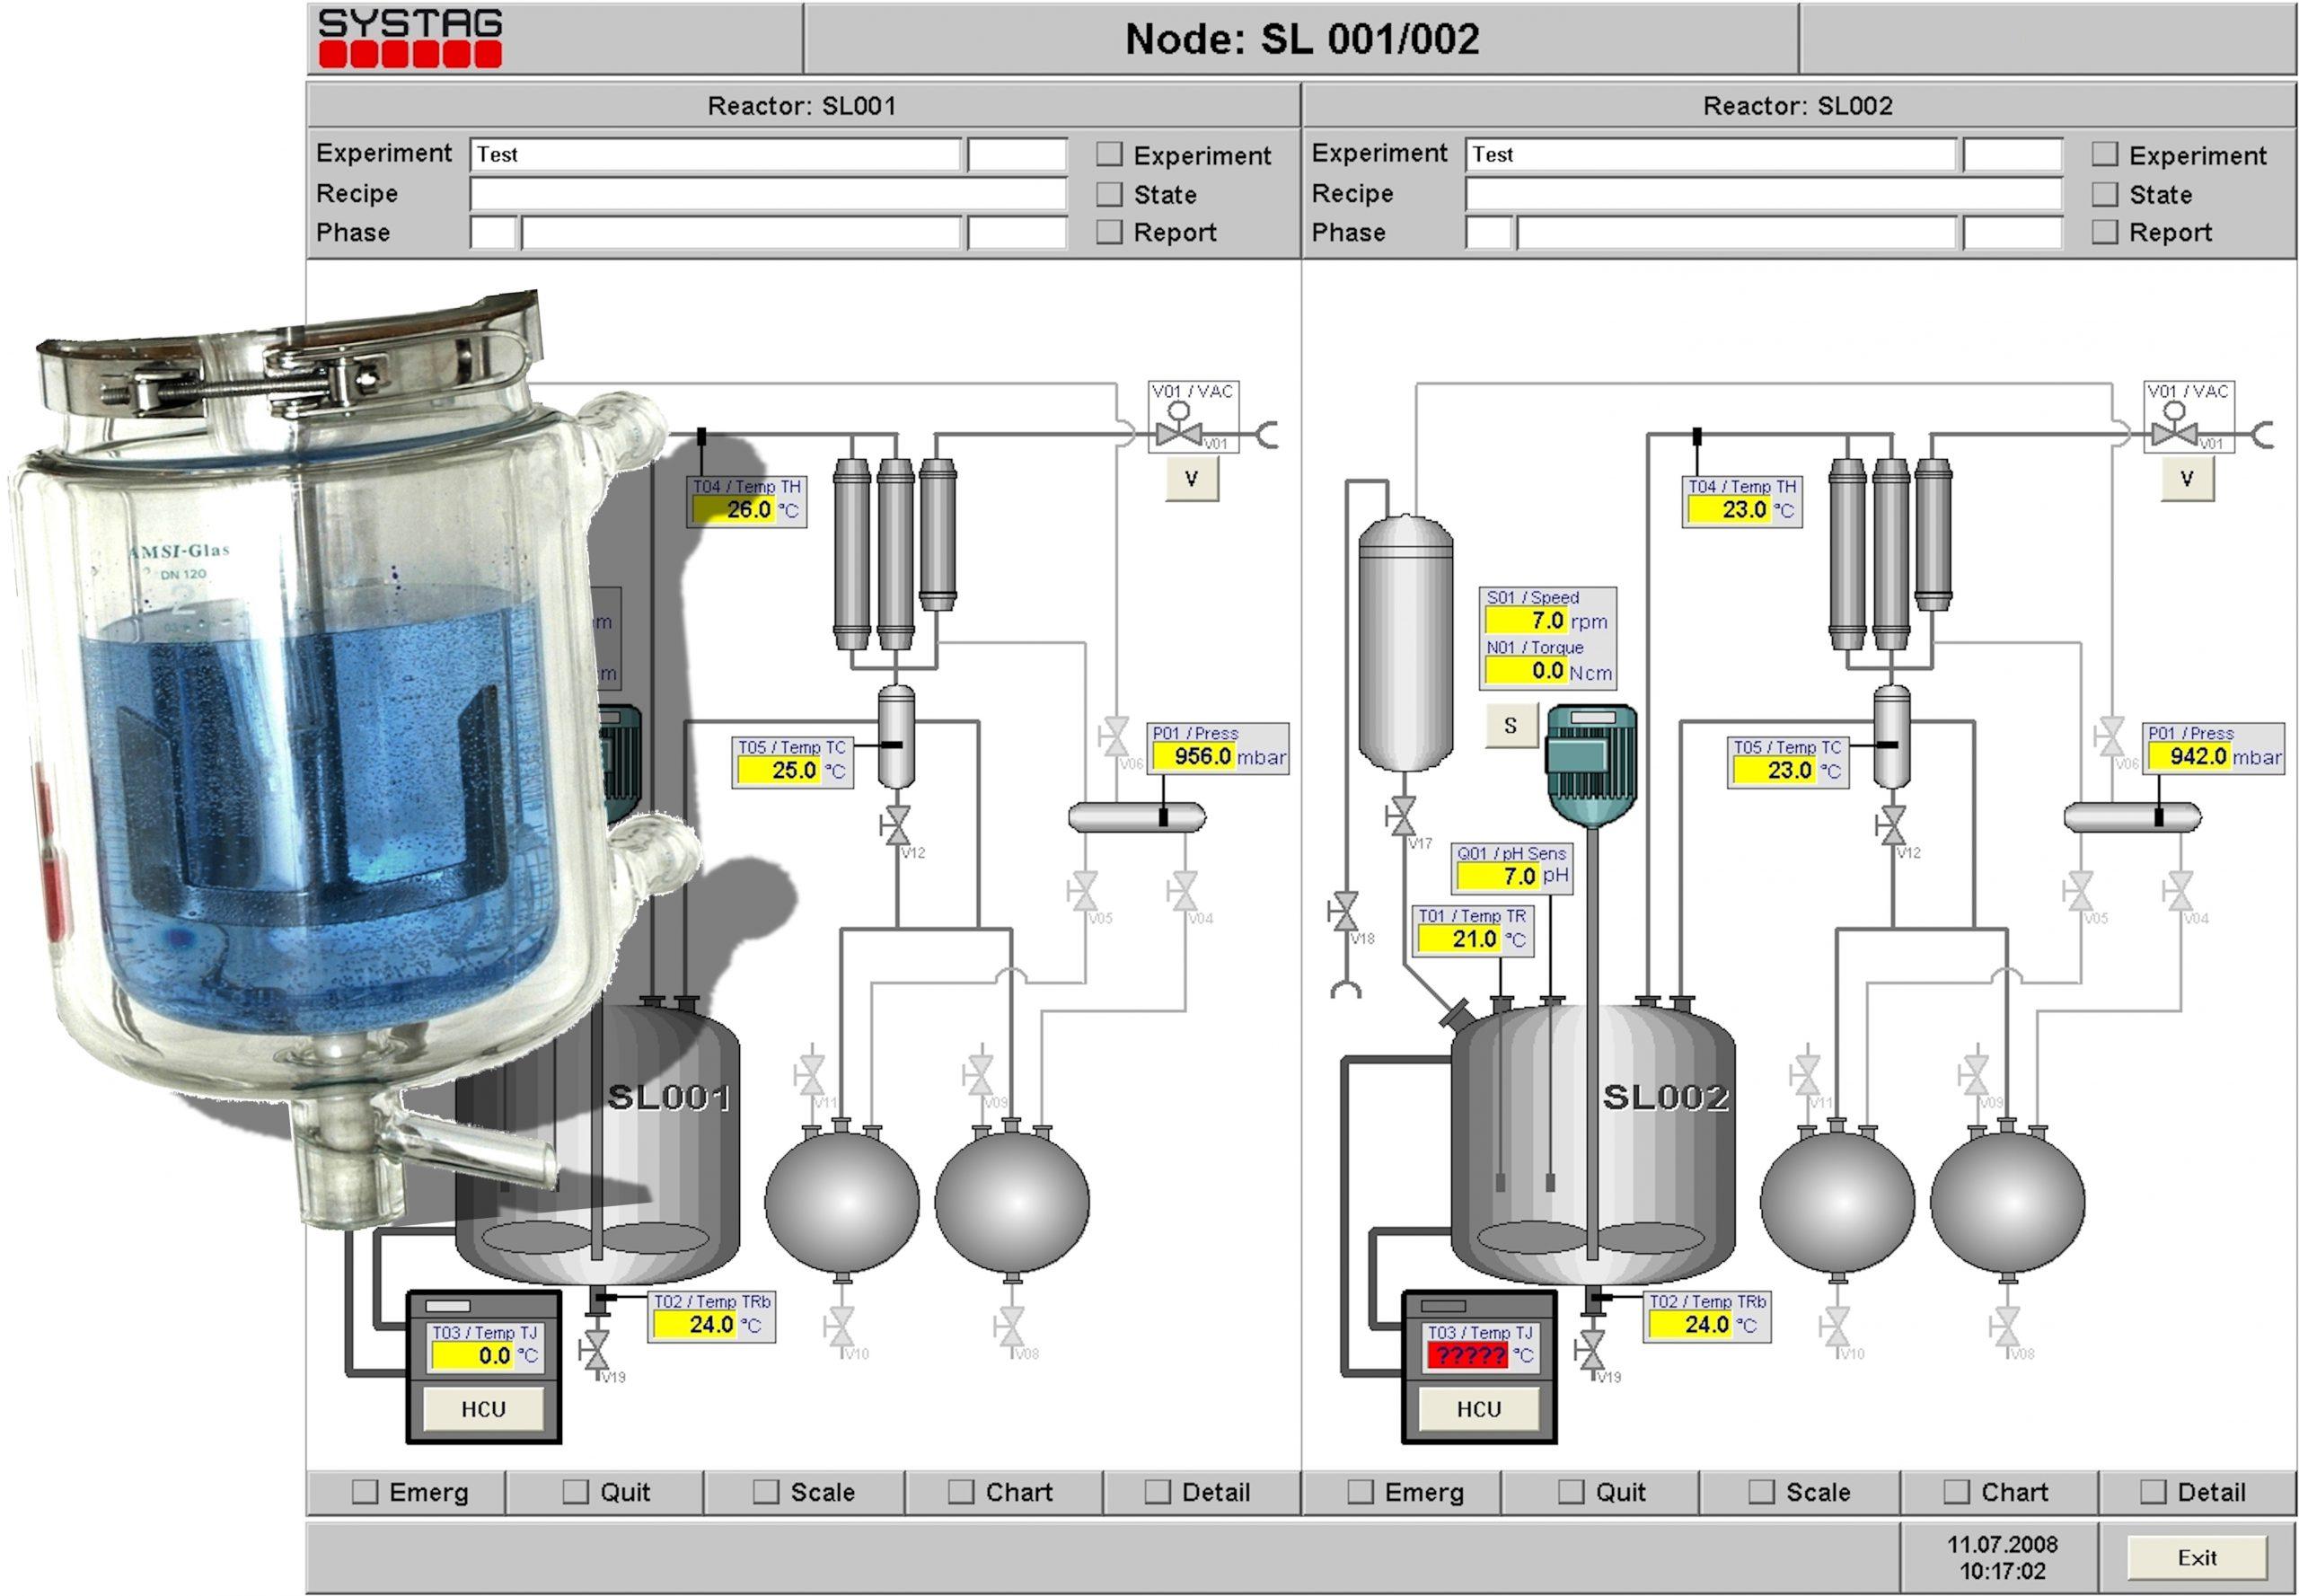 Reliance Reactor